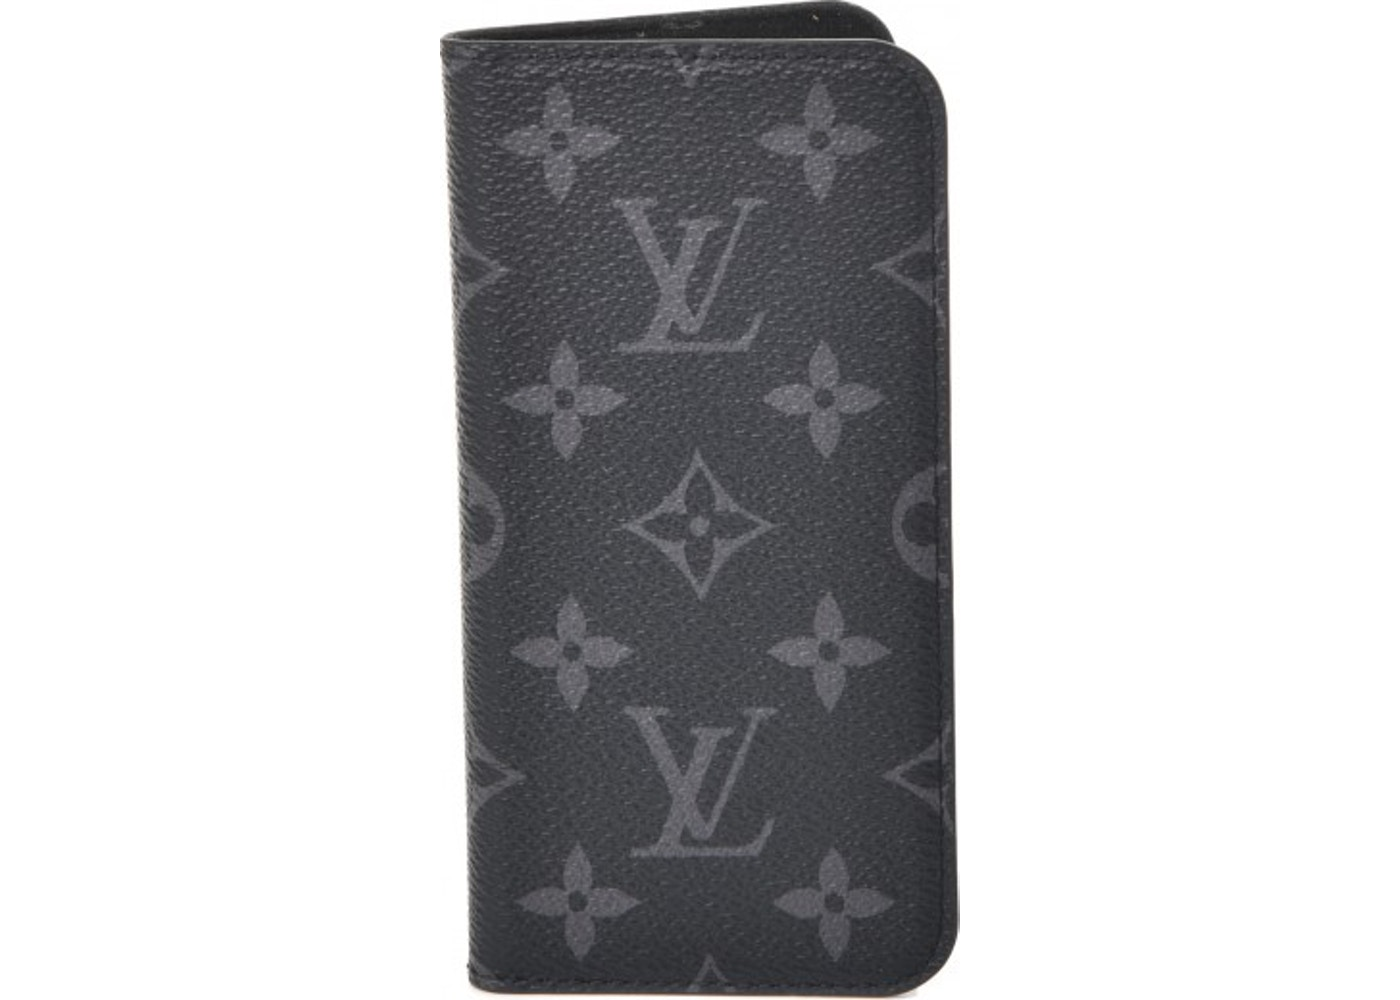 sale retailer 64123 bcefa Louis Vuitton Folio Case iPhone X Monogram Eclipse Gray/Black